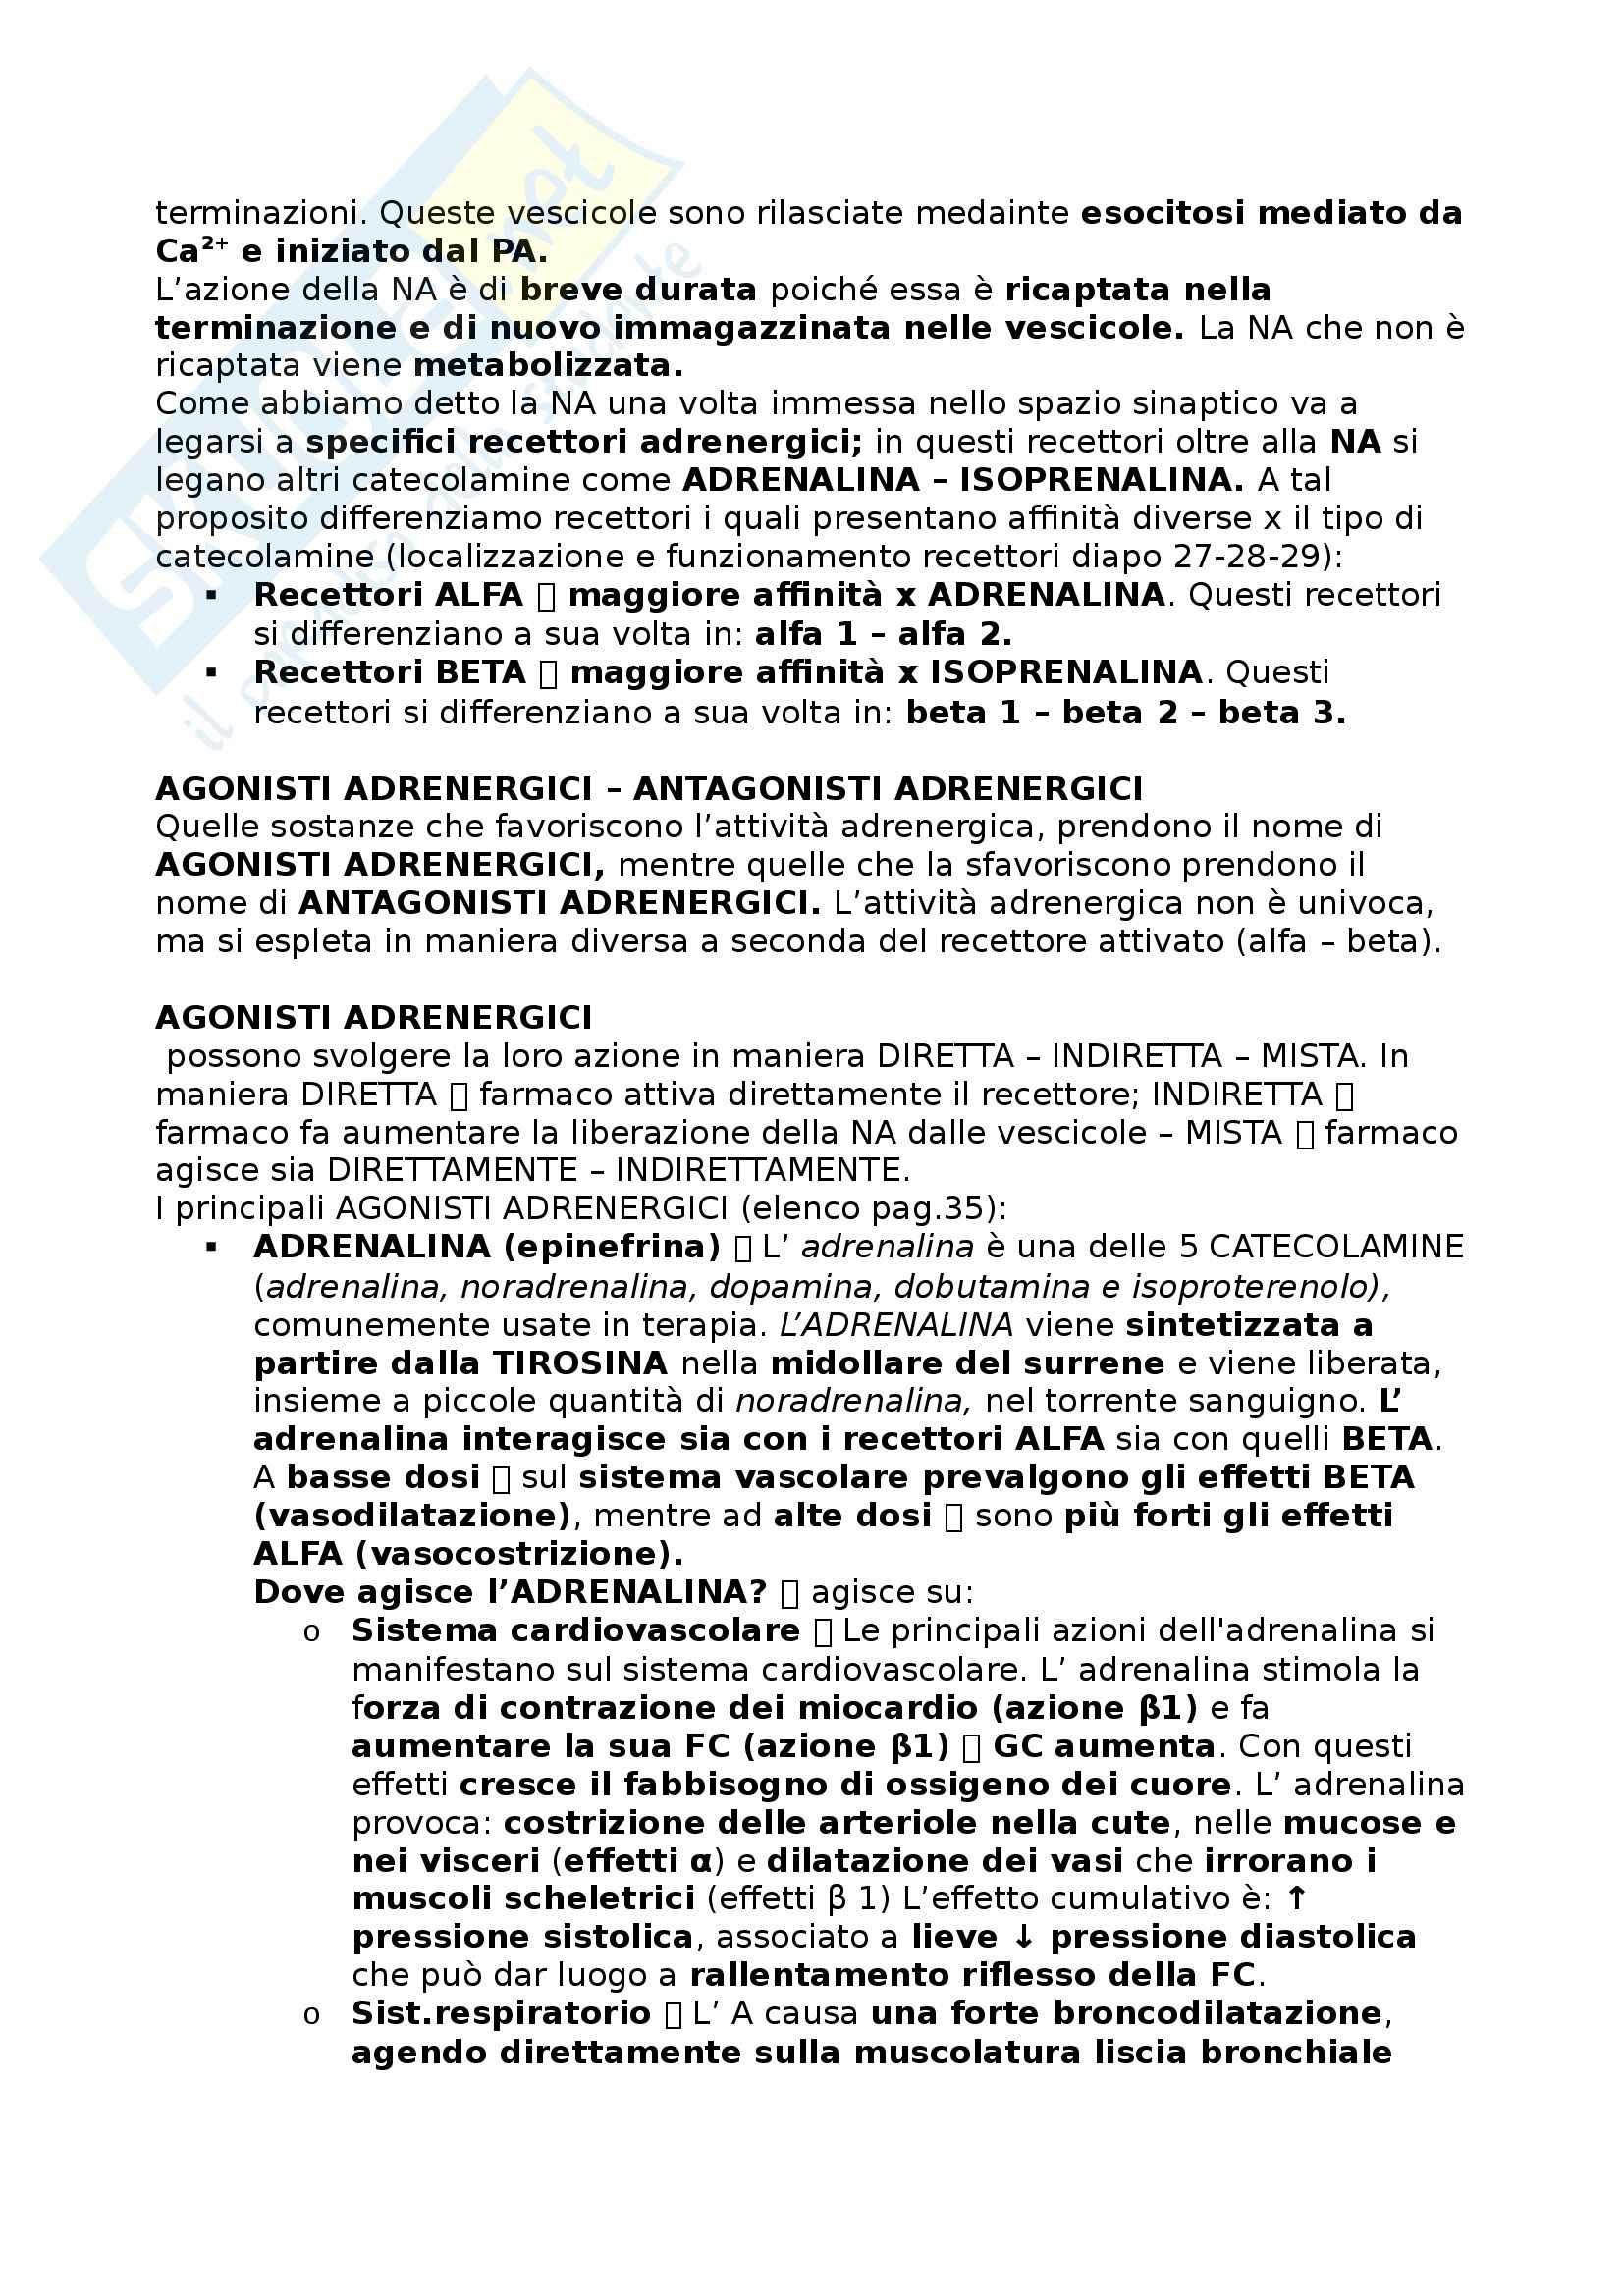 Farmacologia - Appunti Pag. 21